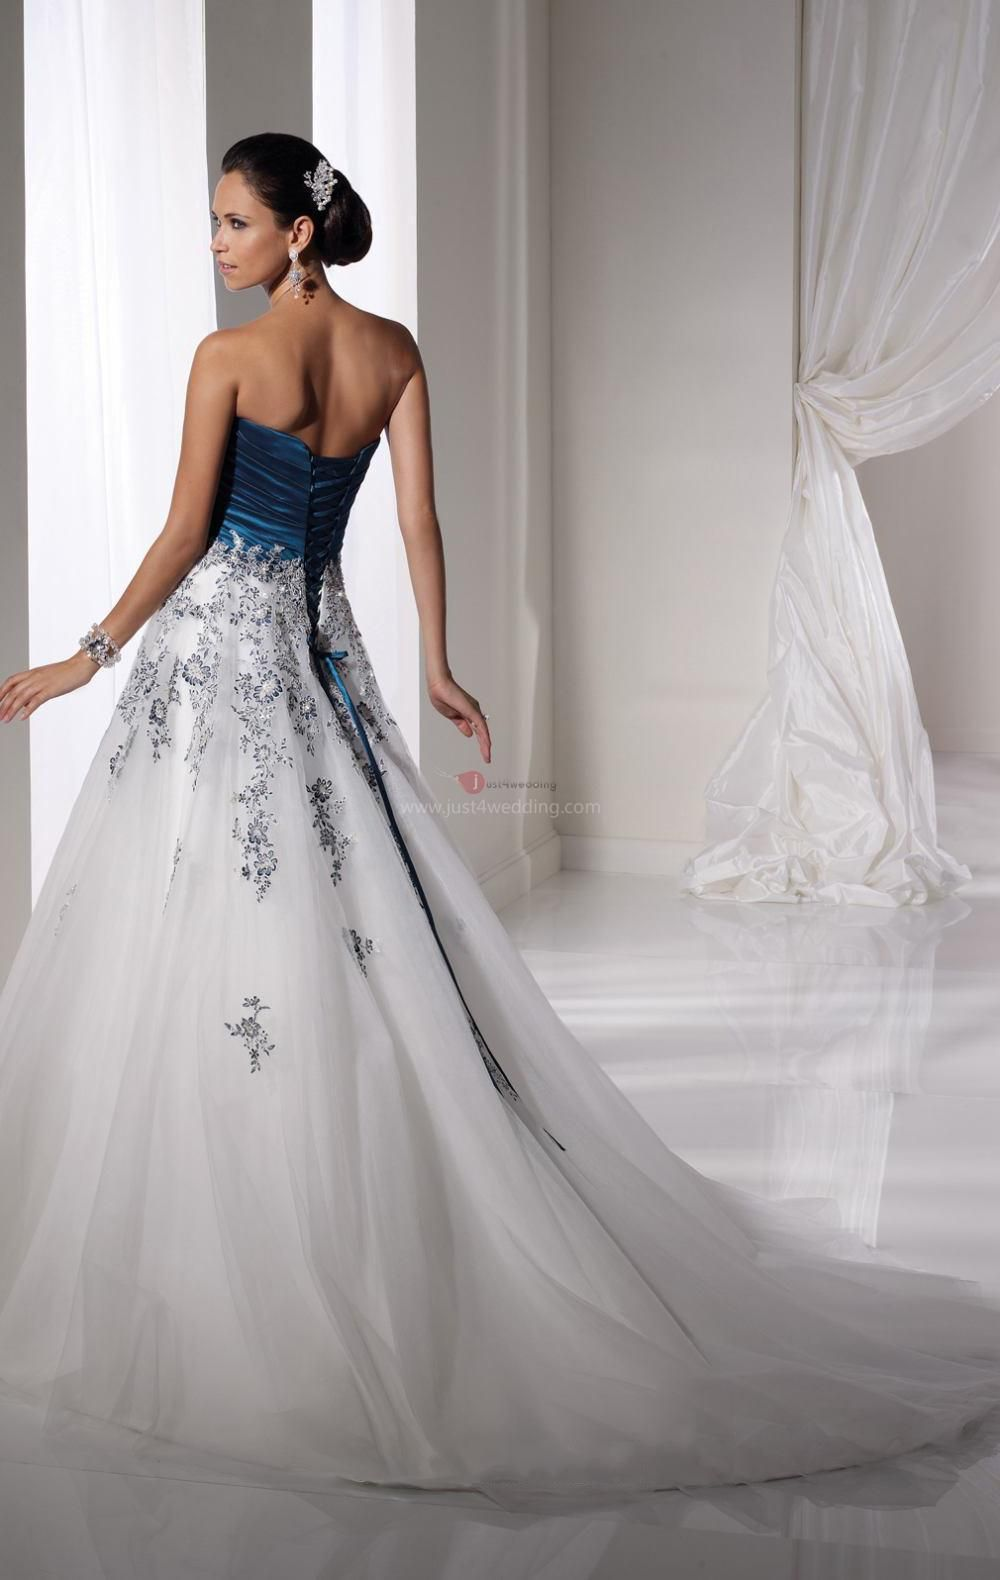 Tall White and Blue Wedding Dress | Blue Wedding Dresses | Pinterest ...